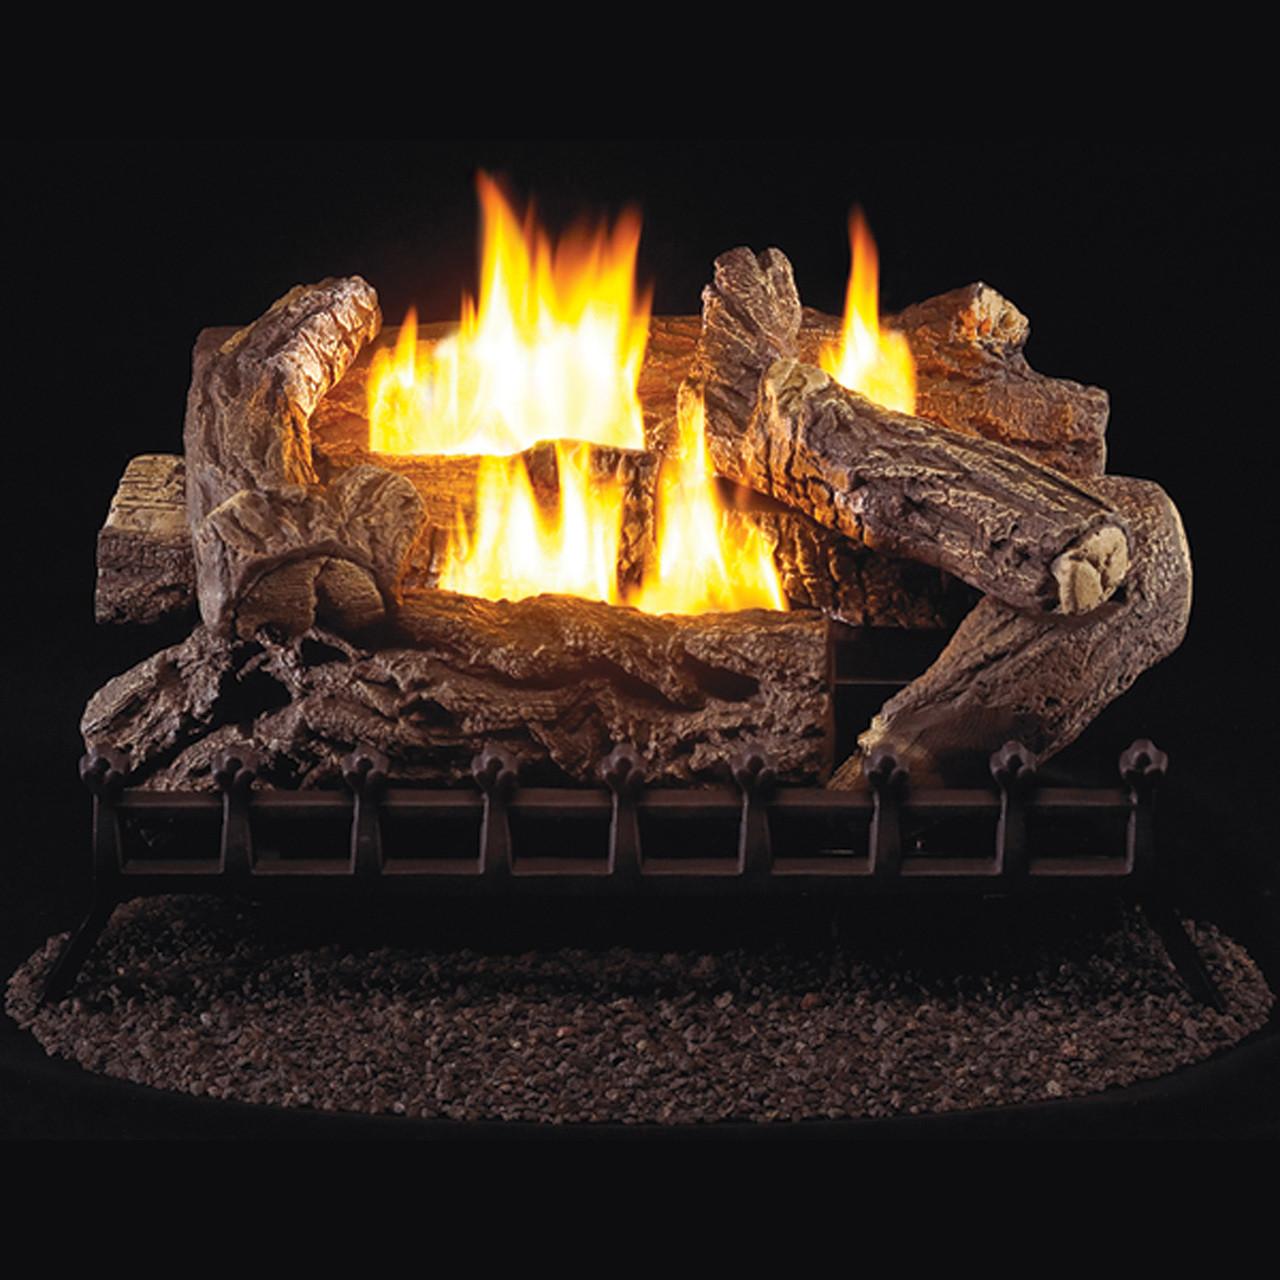 Procom Ventless Propane Gas Log Set 30in 40 000 Btu